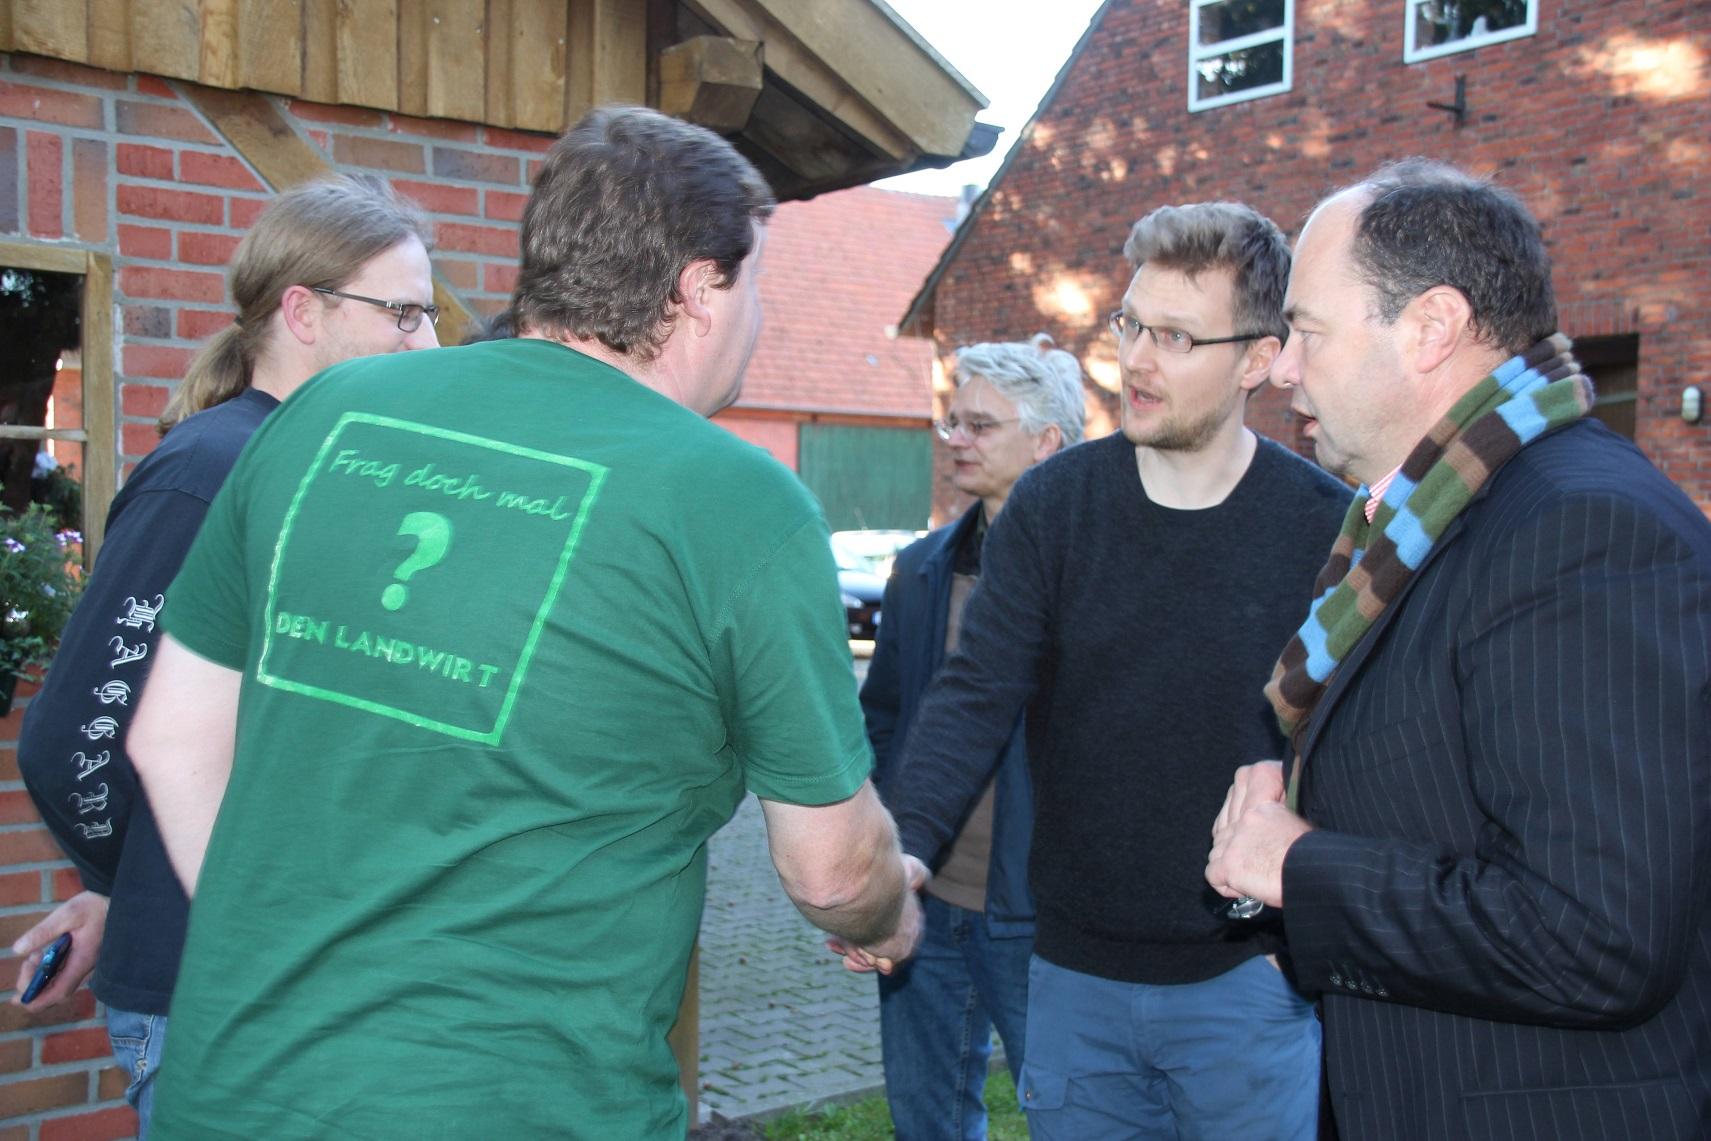 Im Gespräch: Bernhard Barkmann, Thomas Ostendorf, Martin Rücker, Matthias Wolfschmidt (v. li.) Foto: Marlies Grüter